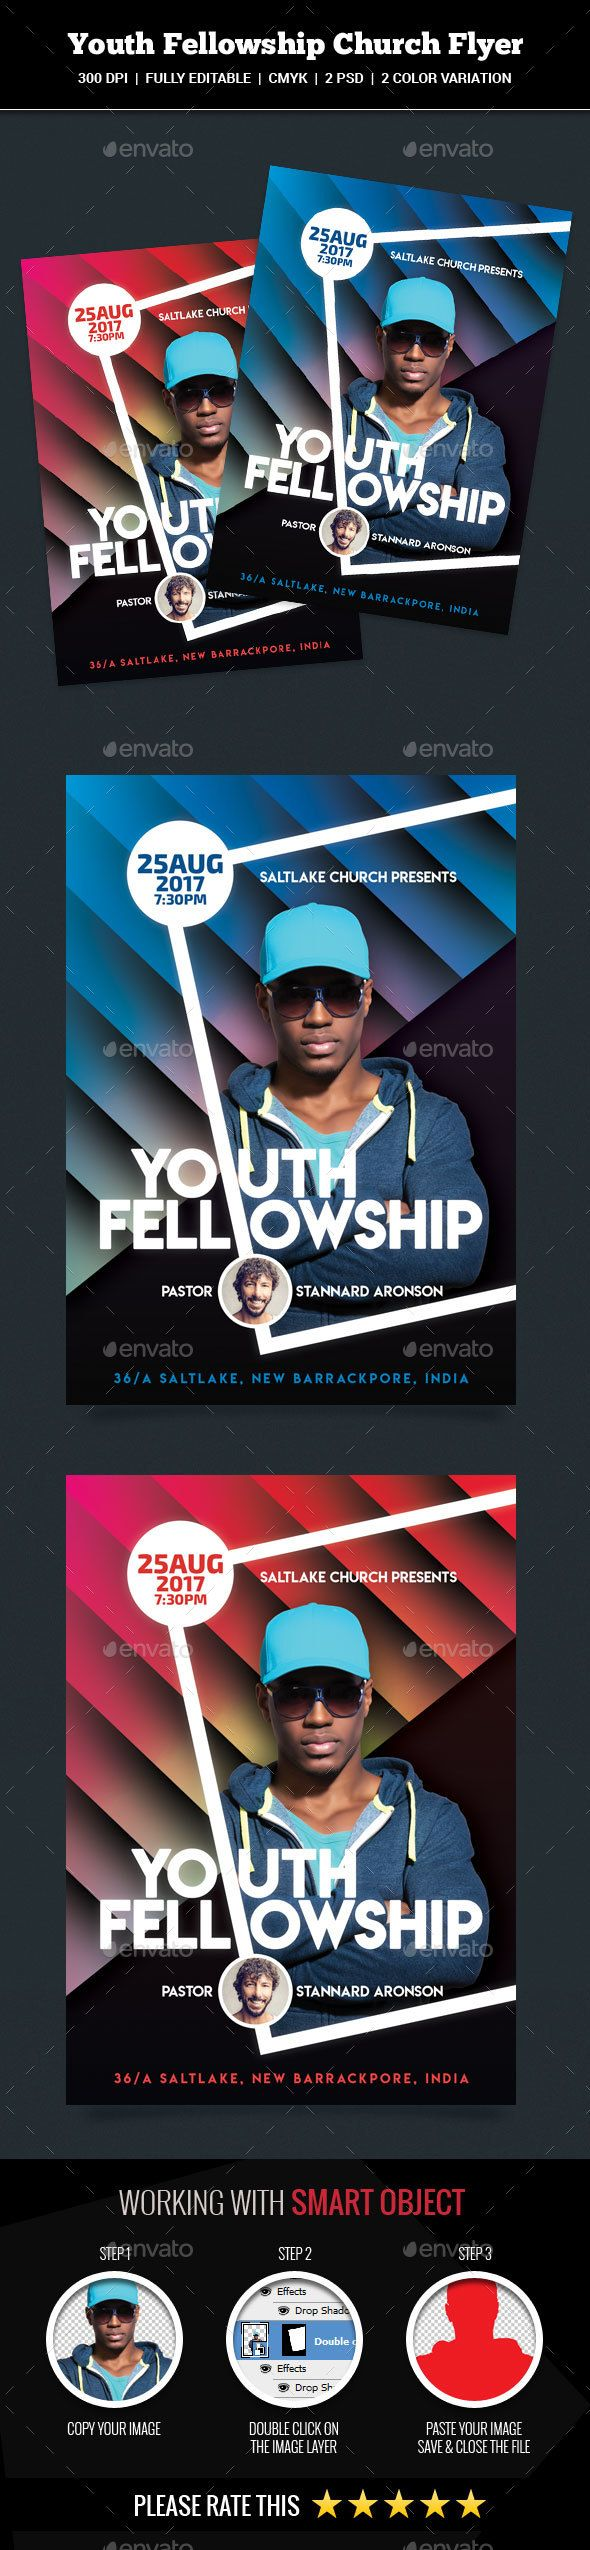 Youth Fellowship Church Flyer - #Church #Flyers